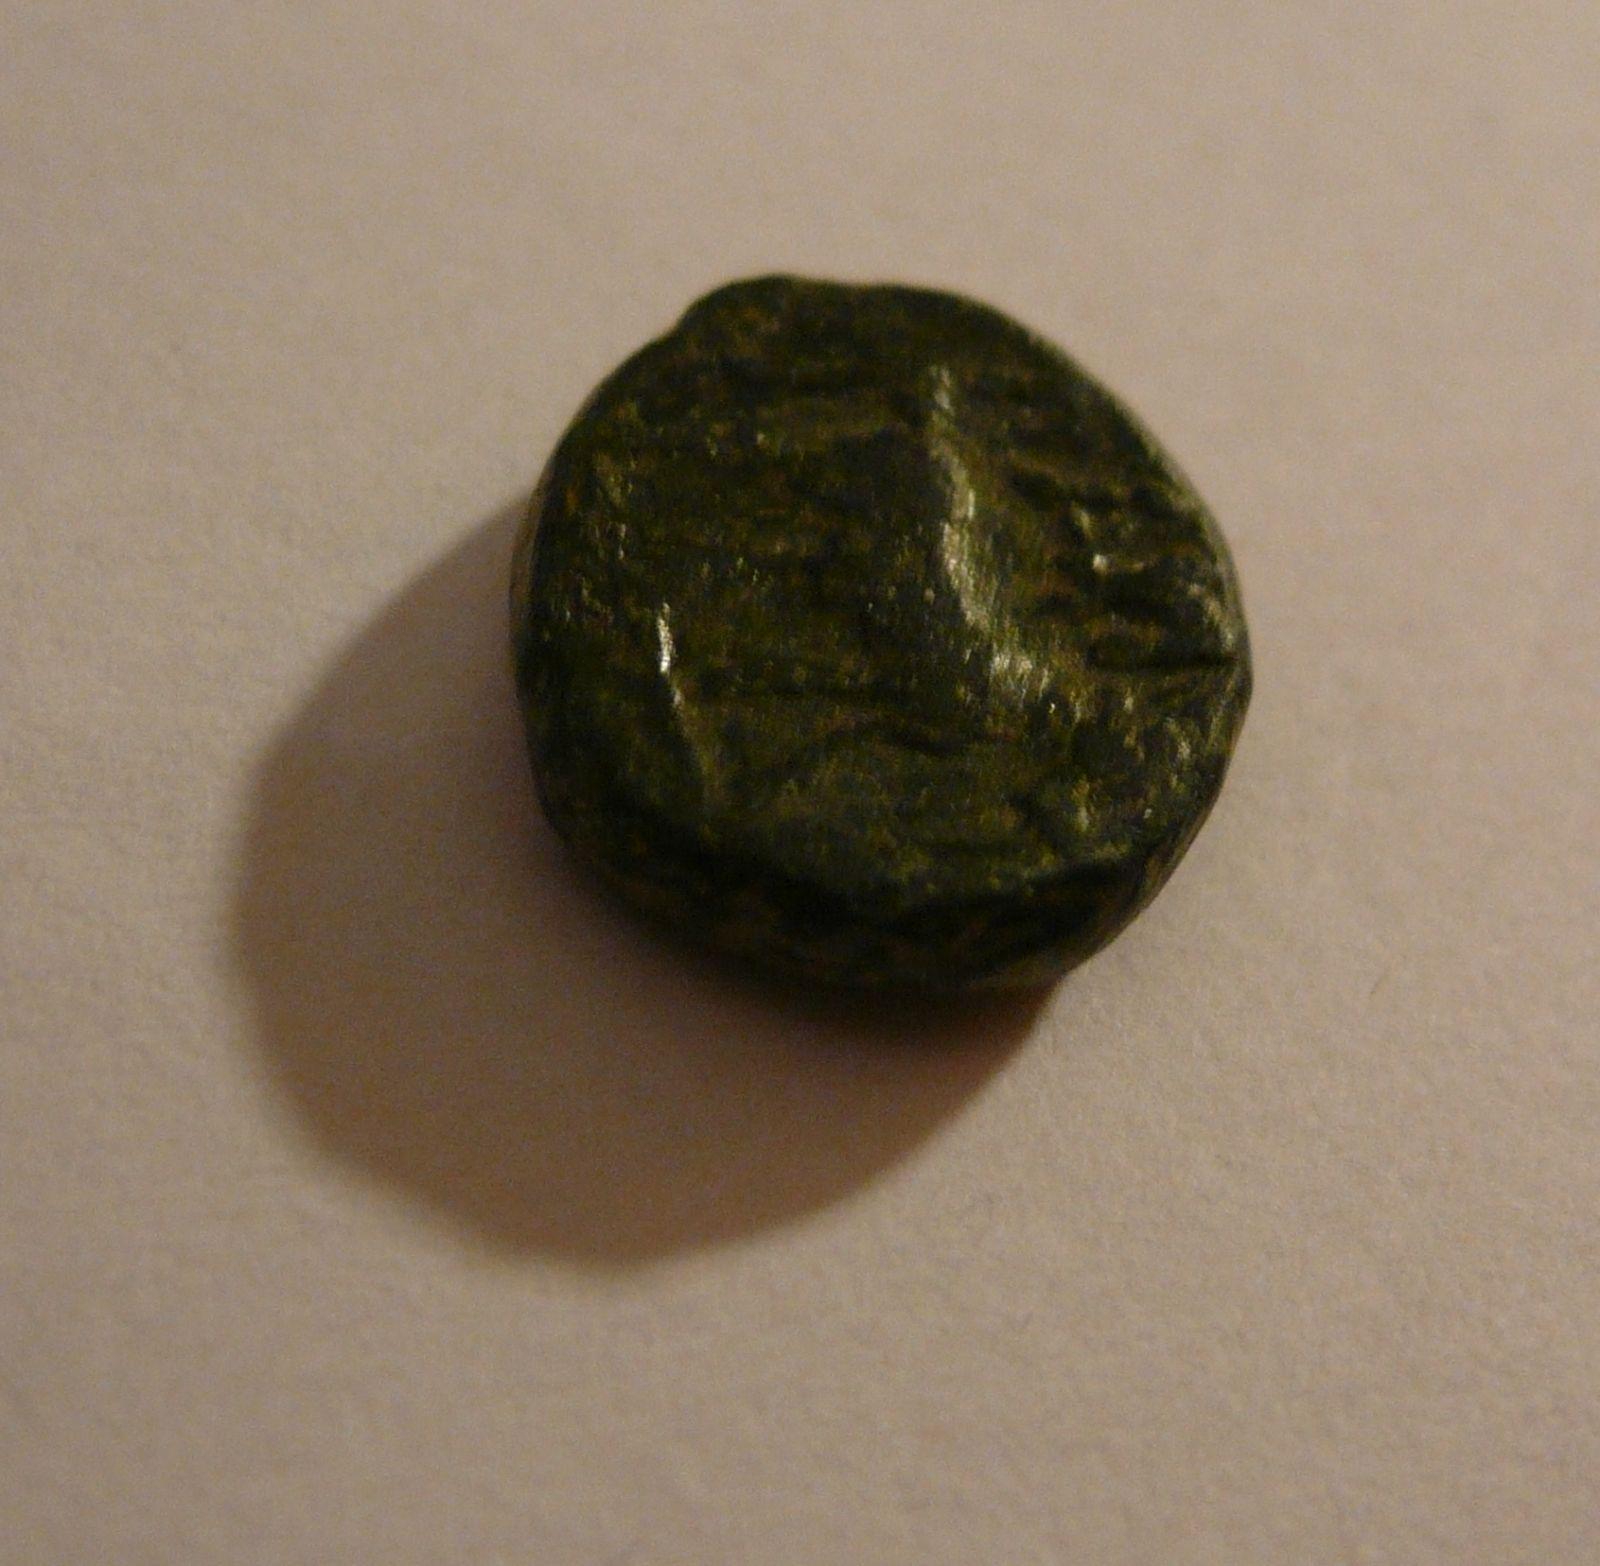 AE-15, Pergamon, Athena, Řecko-Mysia, 350-300 př.n.l.